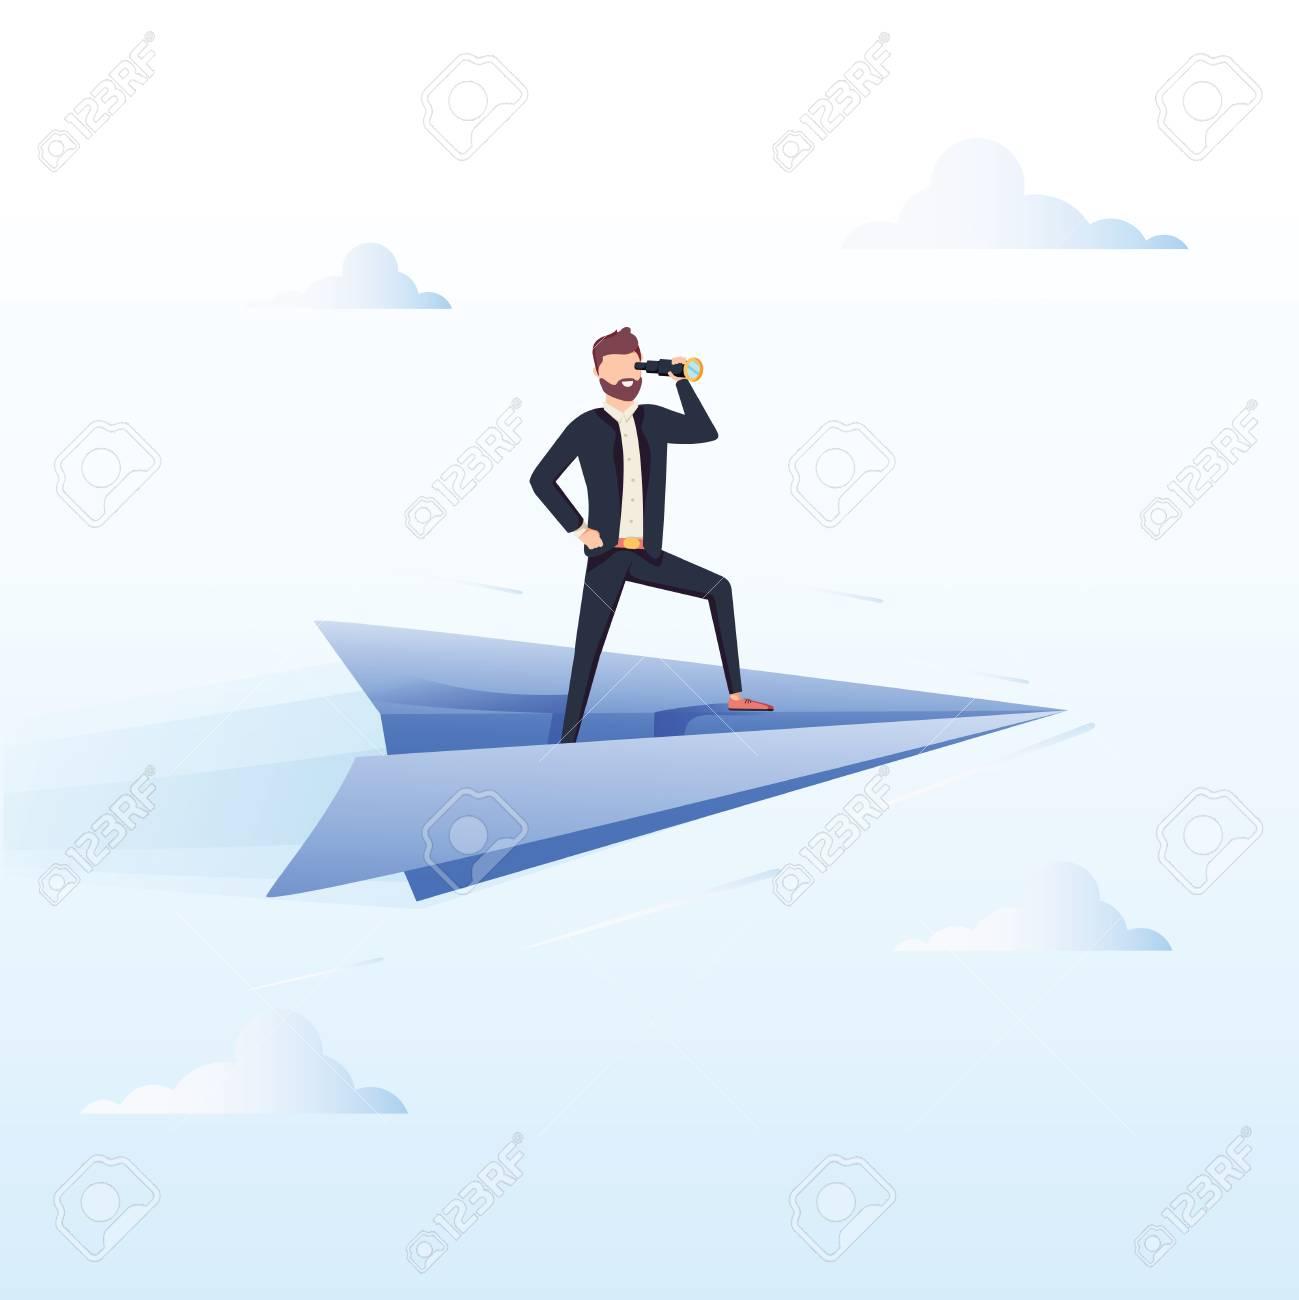 Ready to Fly. Business vector concept illustration. Winner business and achievement concept. Business success. Big trophy for businessmen. Ambition success, achievment motivation business background - 127716638